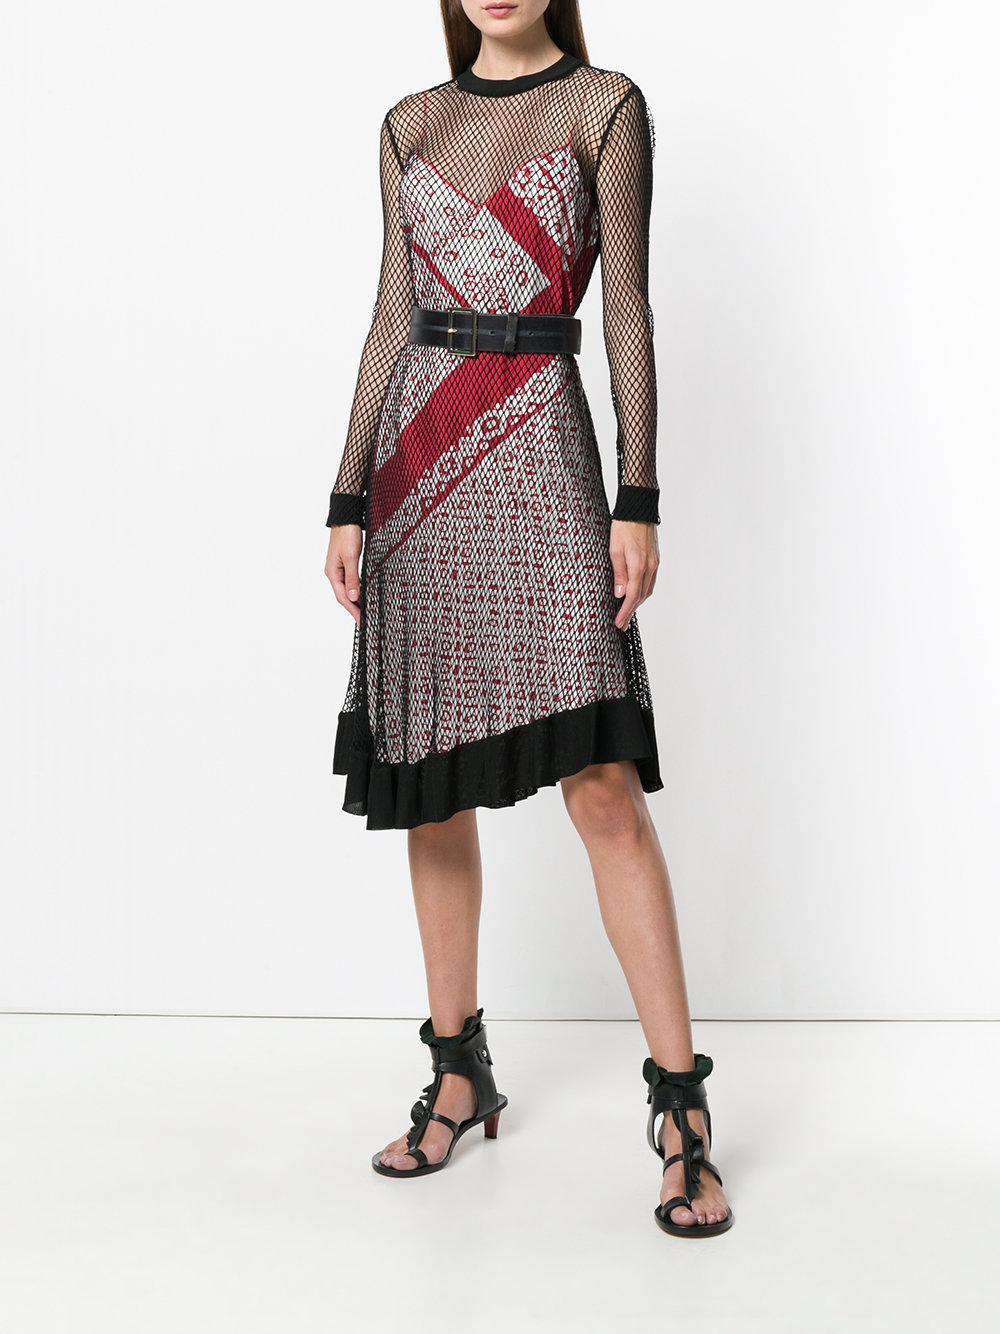 engineered animal stripe print cami dress with mesh overlayer - Multicolour Altuzarra JDTAYFk